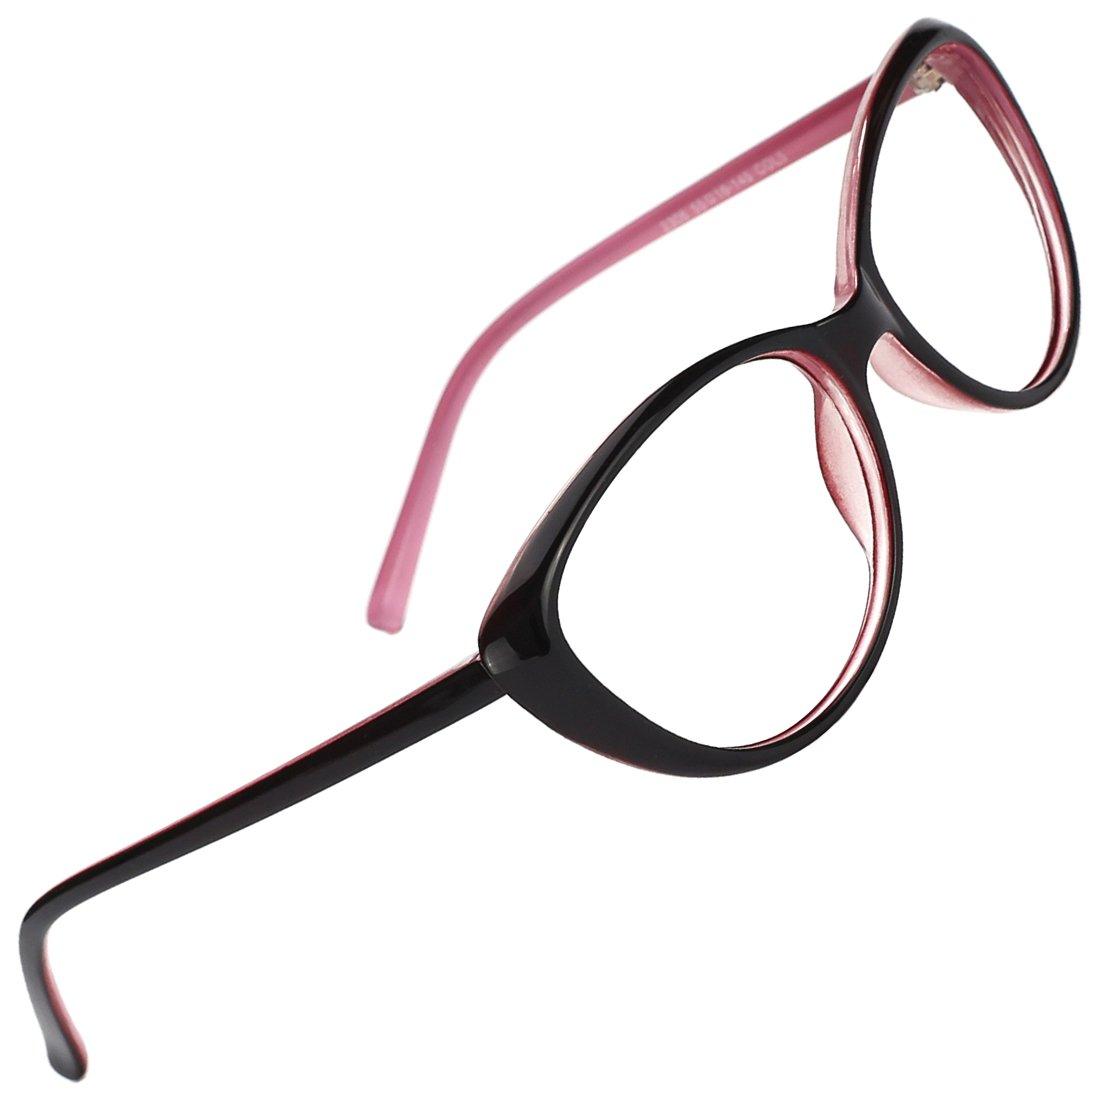 Slocyclub New Vintage Cateye Glasses Full Rim Optical Eyewear for Women 00081501